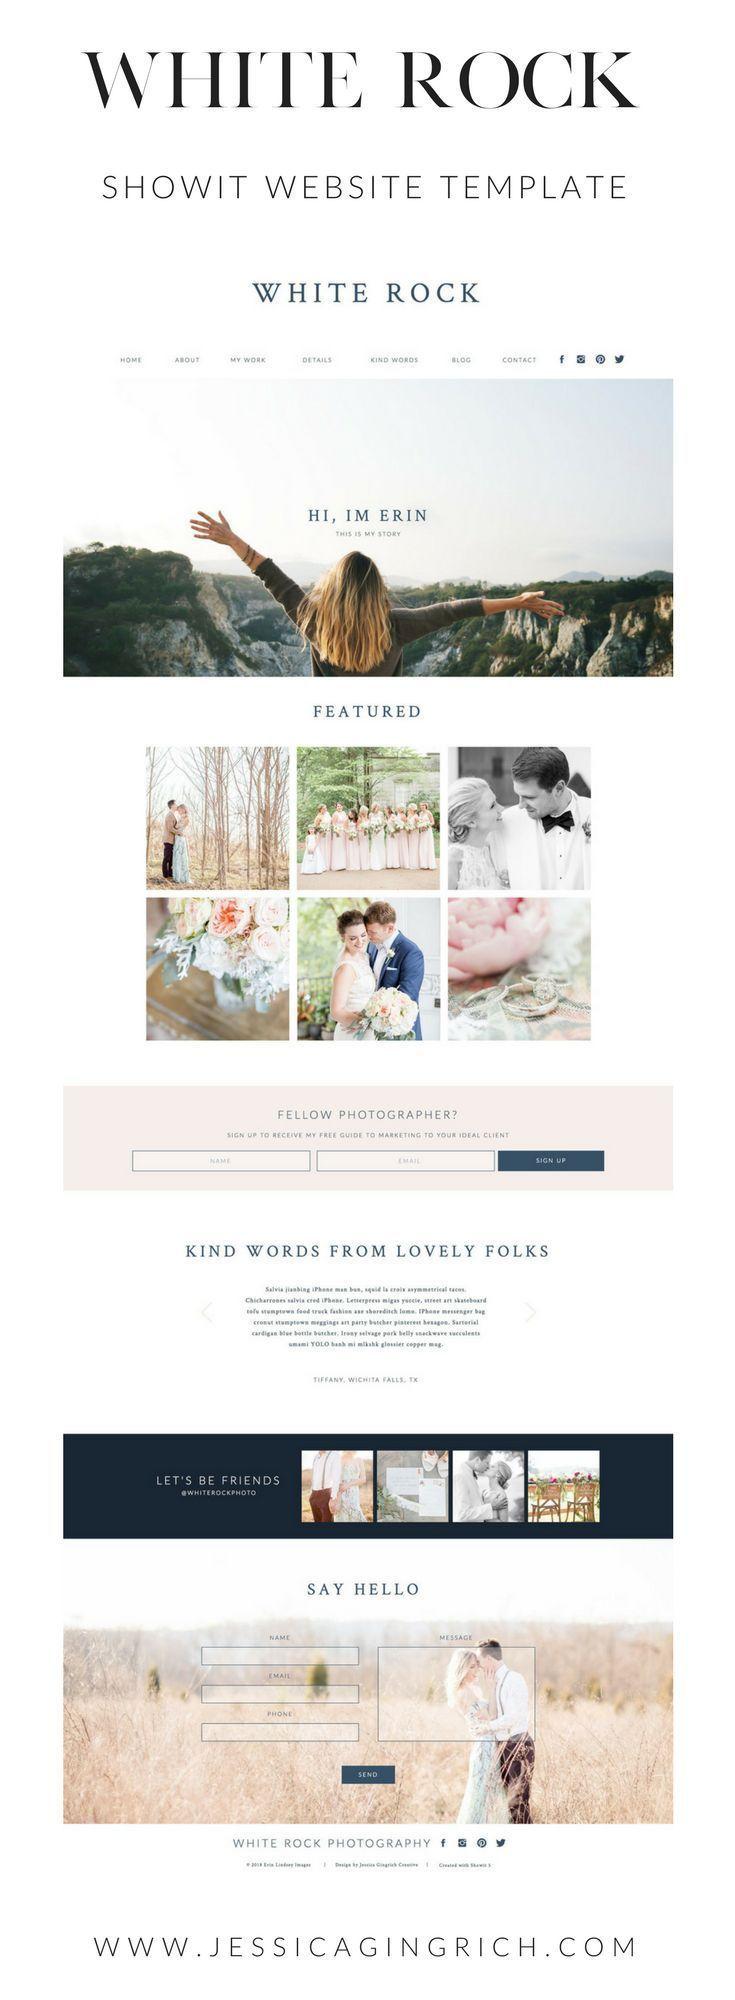 White Rock Showit Website Template Website Design For Creative Entrepreneurs And Photog Photography Website Design Photographer Website Website Design Layout